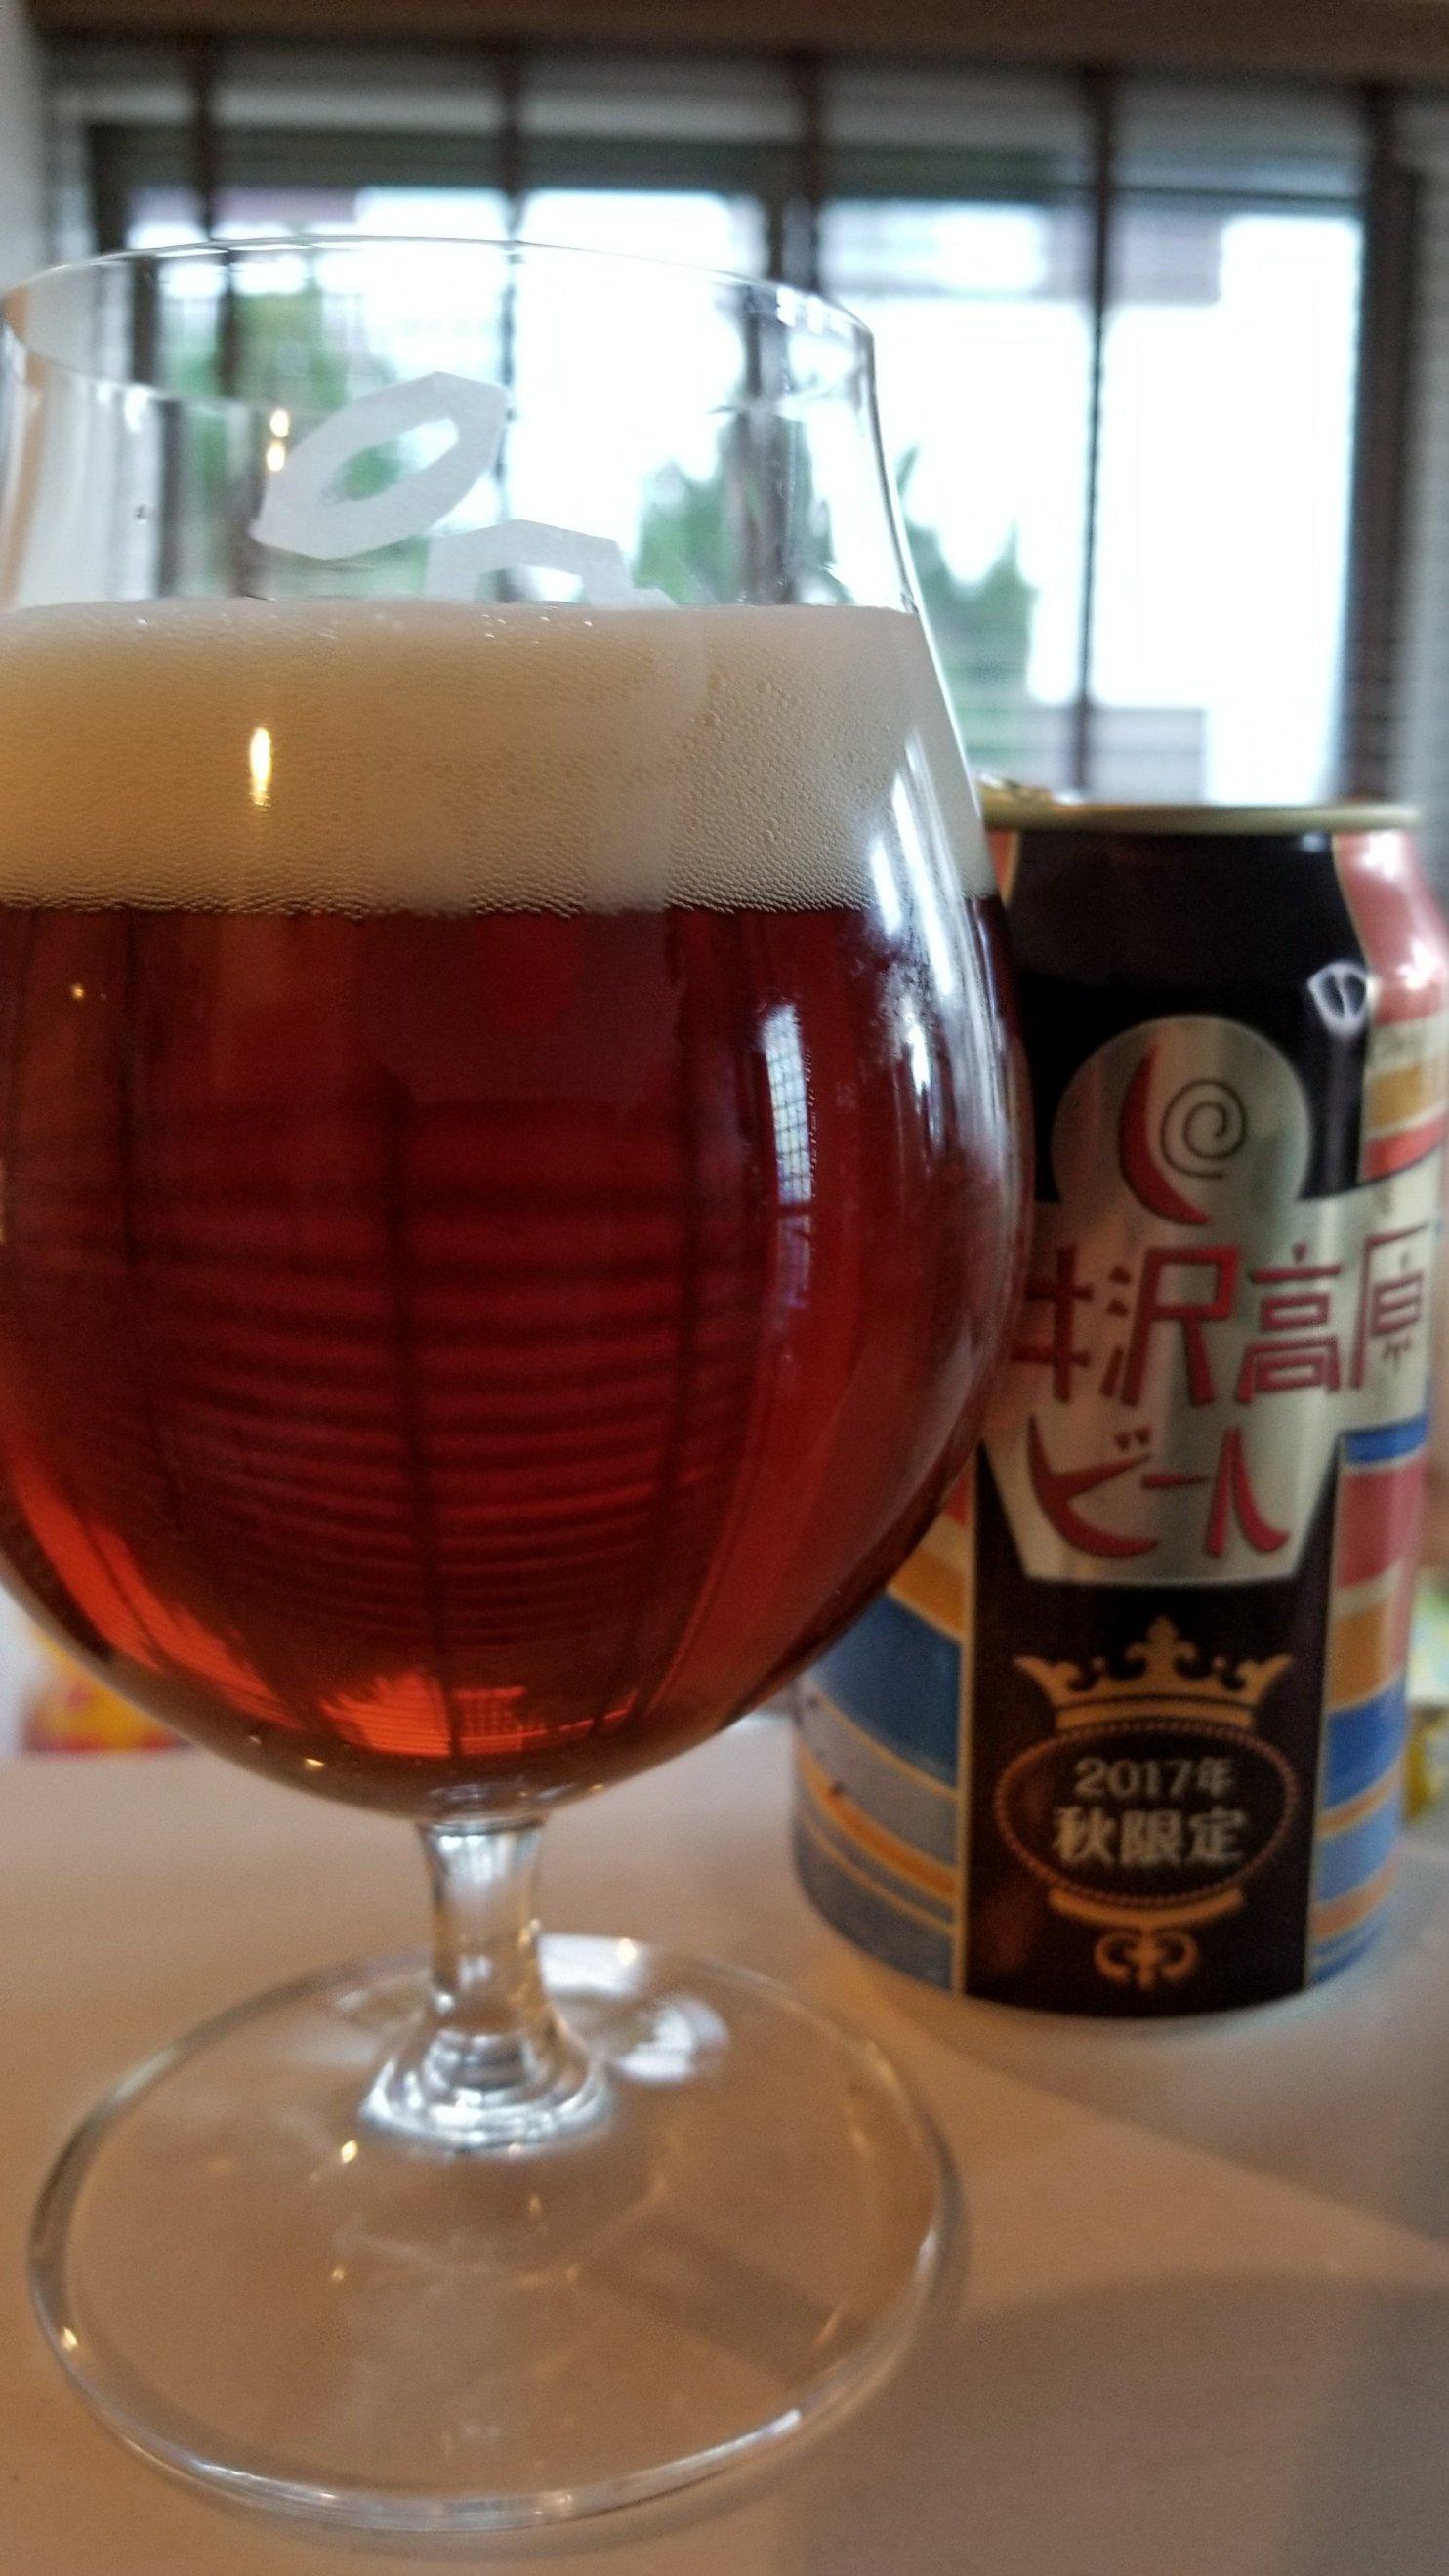 Karuizawa Kogen Brown Ale 軽井沢高原ブラウンエール